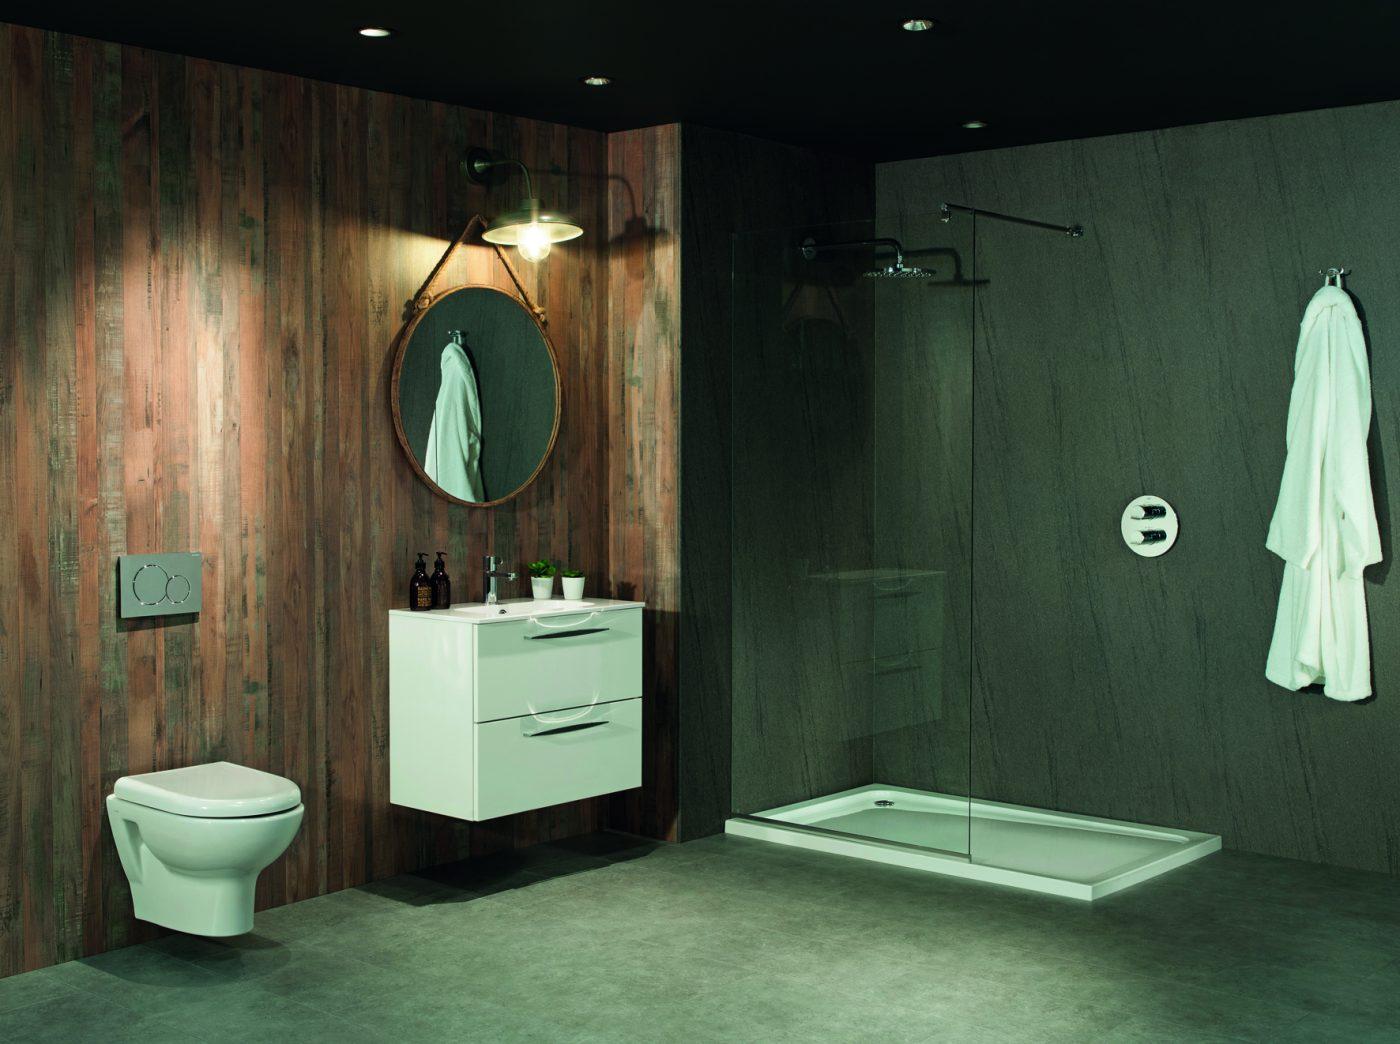 Toilet Beton Cire : Beton cire aq aqua step r waterproof laminate best at